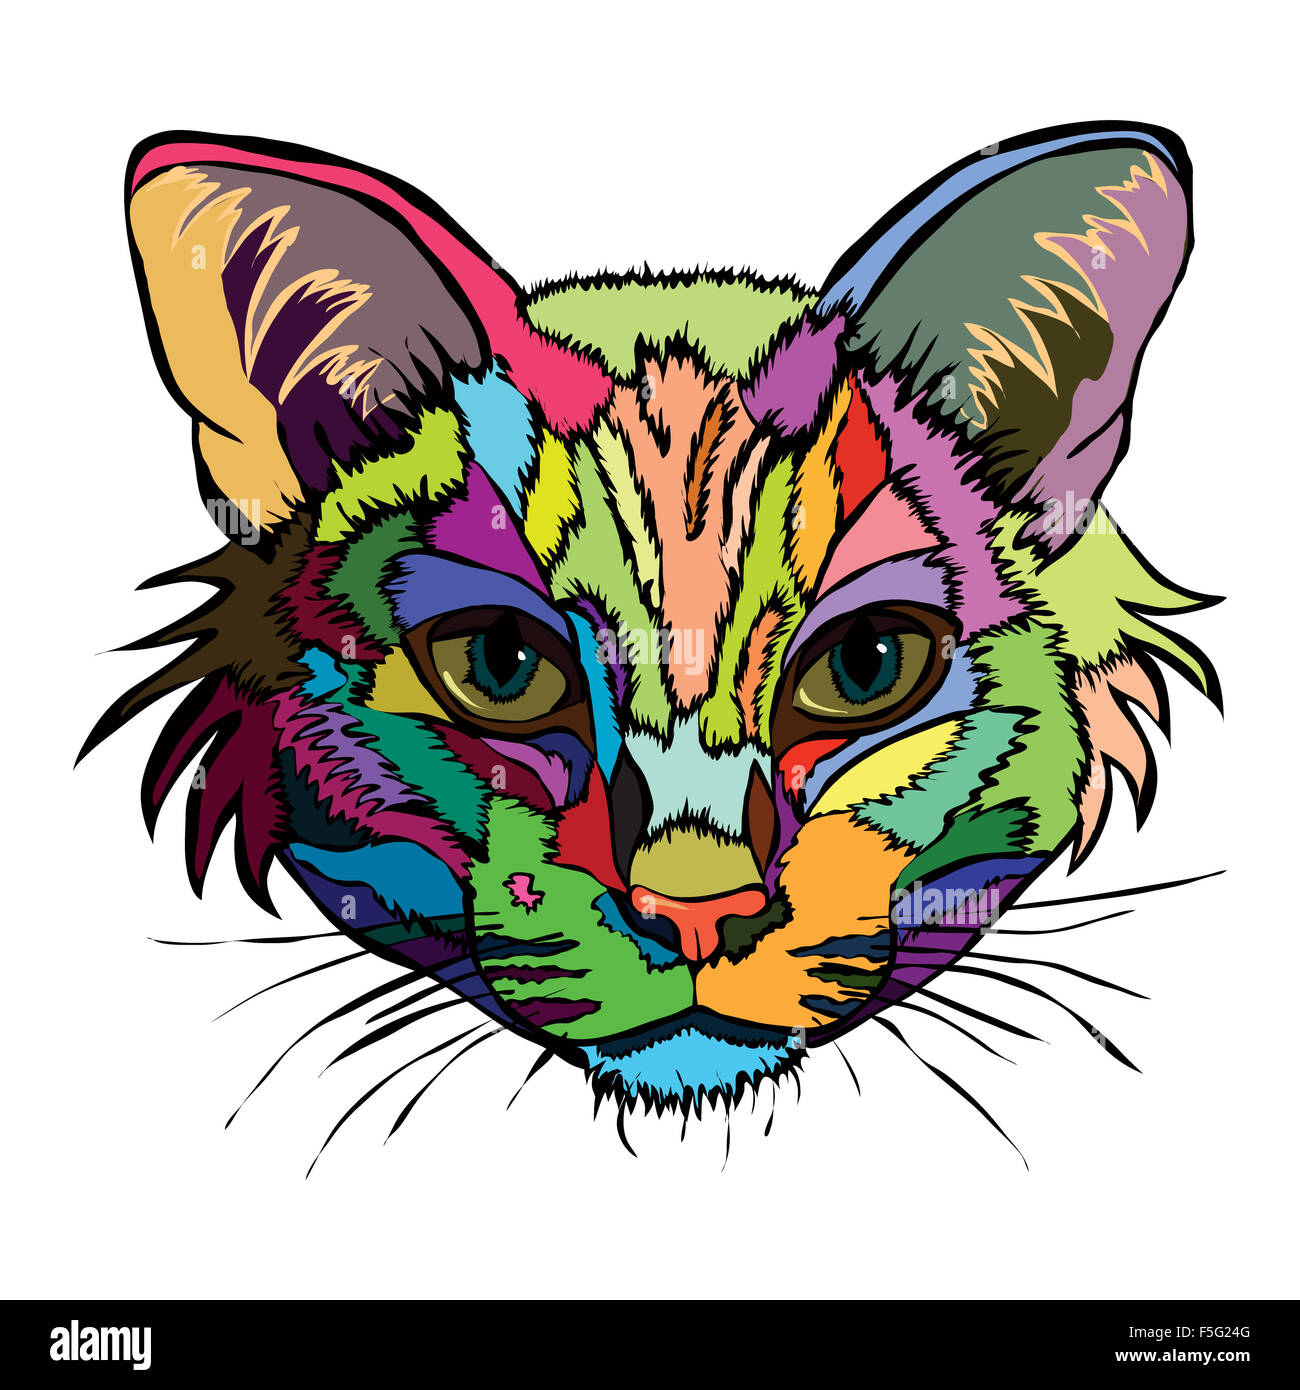 vector illustration pop art portrait of a cat on a white background